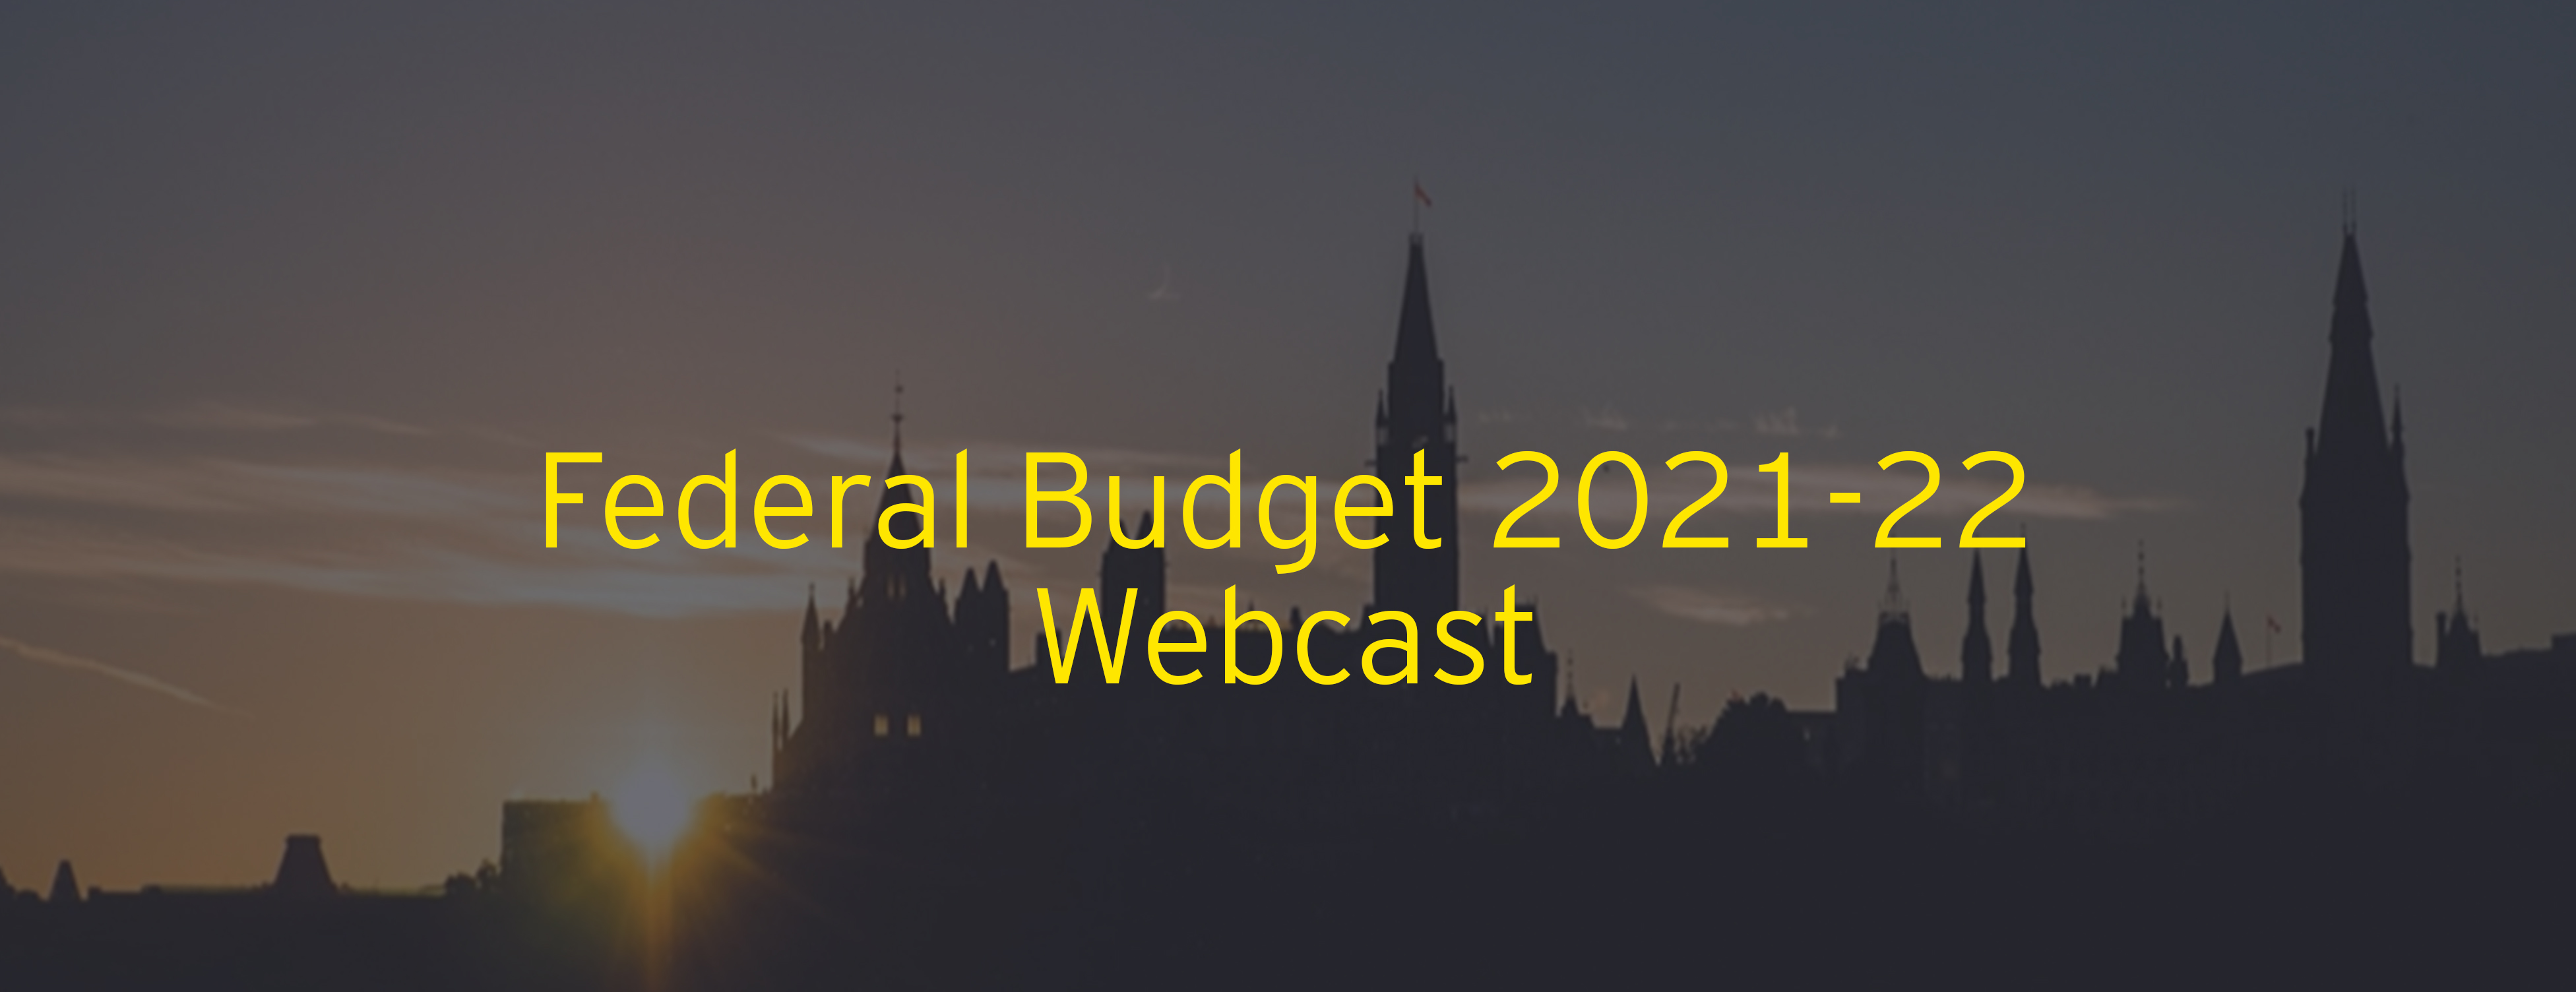 Federal Budget 2021-22 Webcast